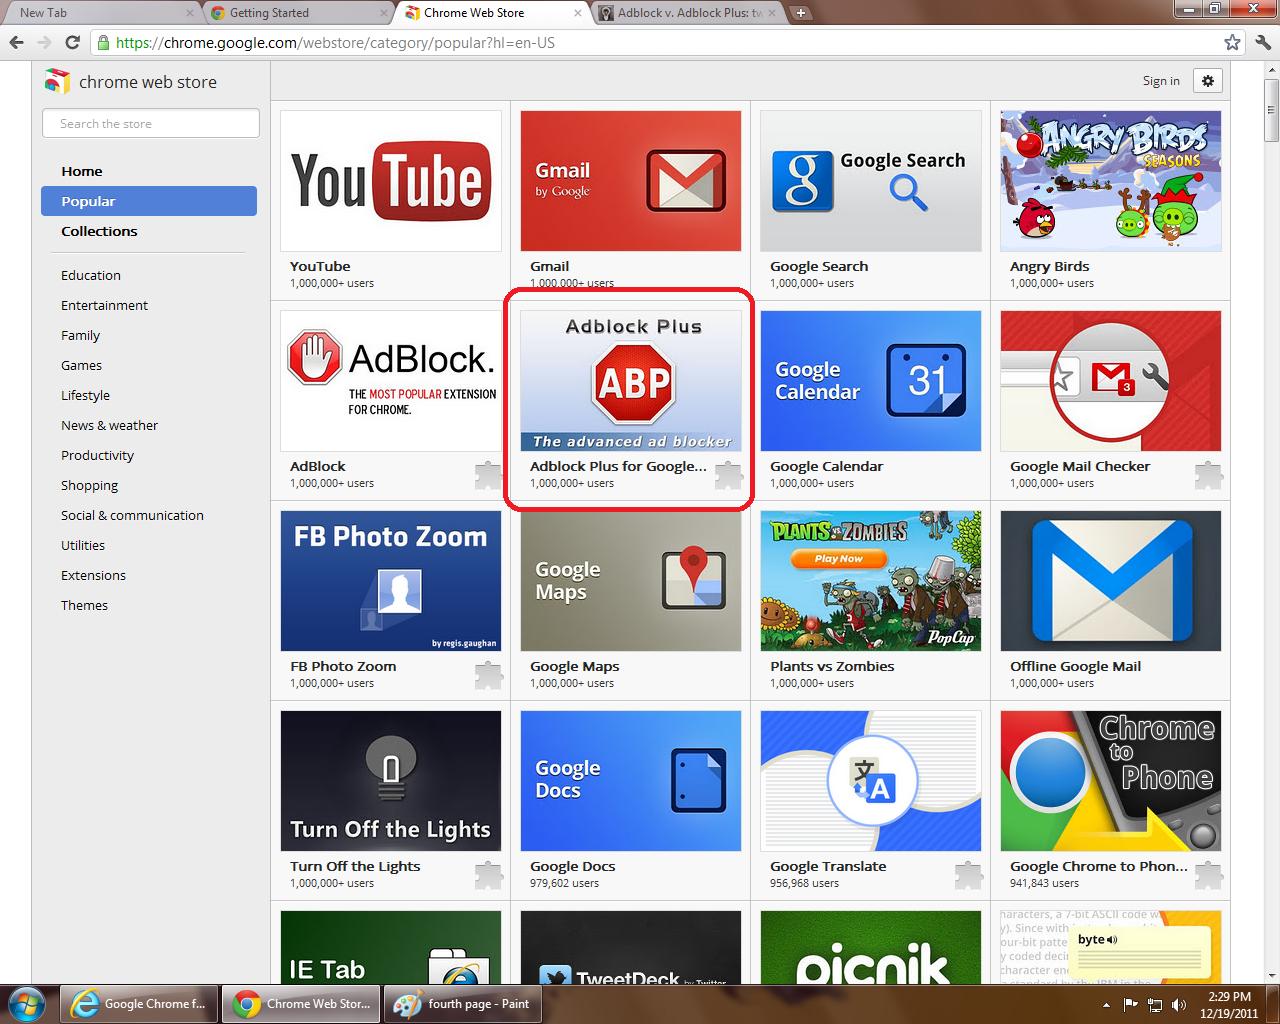 Help i keep getting viruses even with antivirus installed google